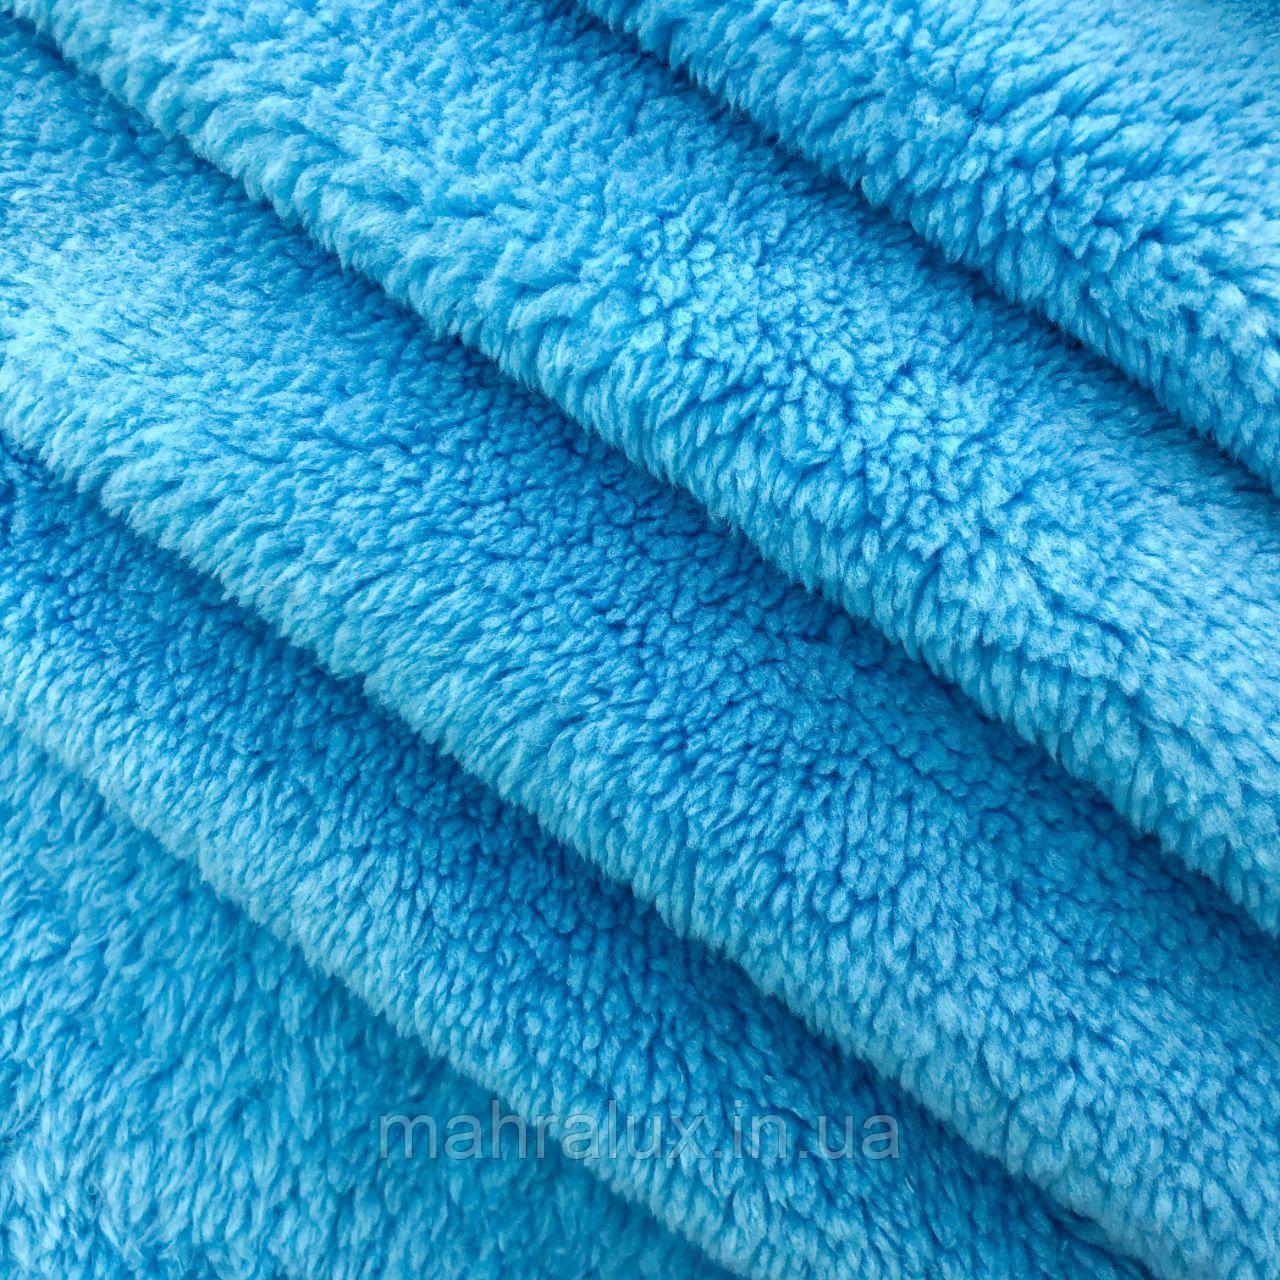 Махра велсофт (Wellsoft) голубая